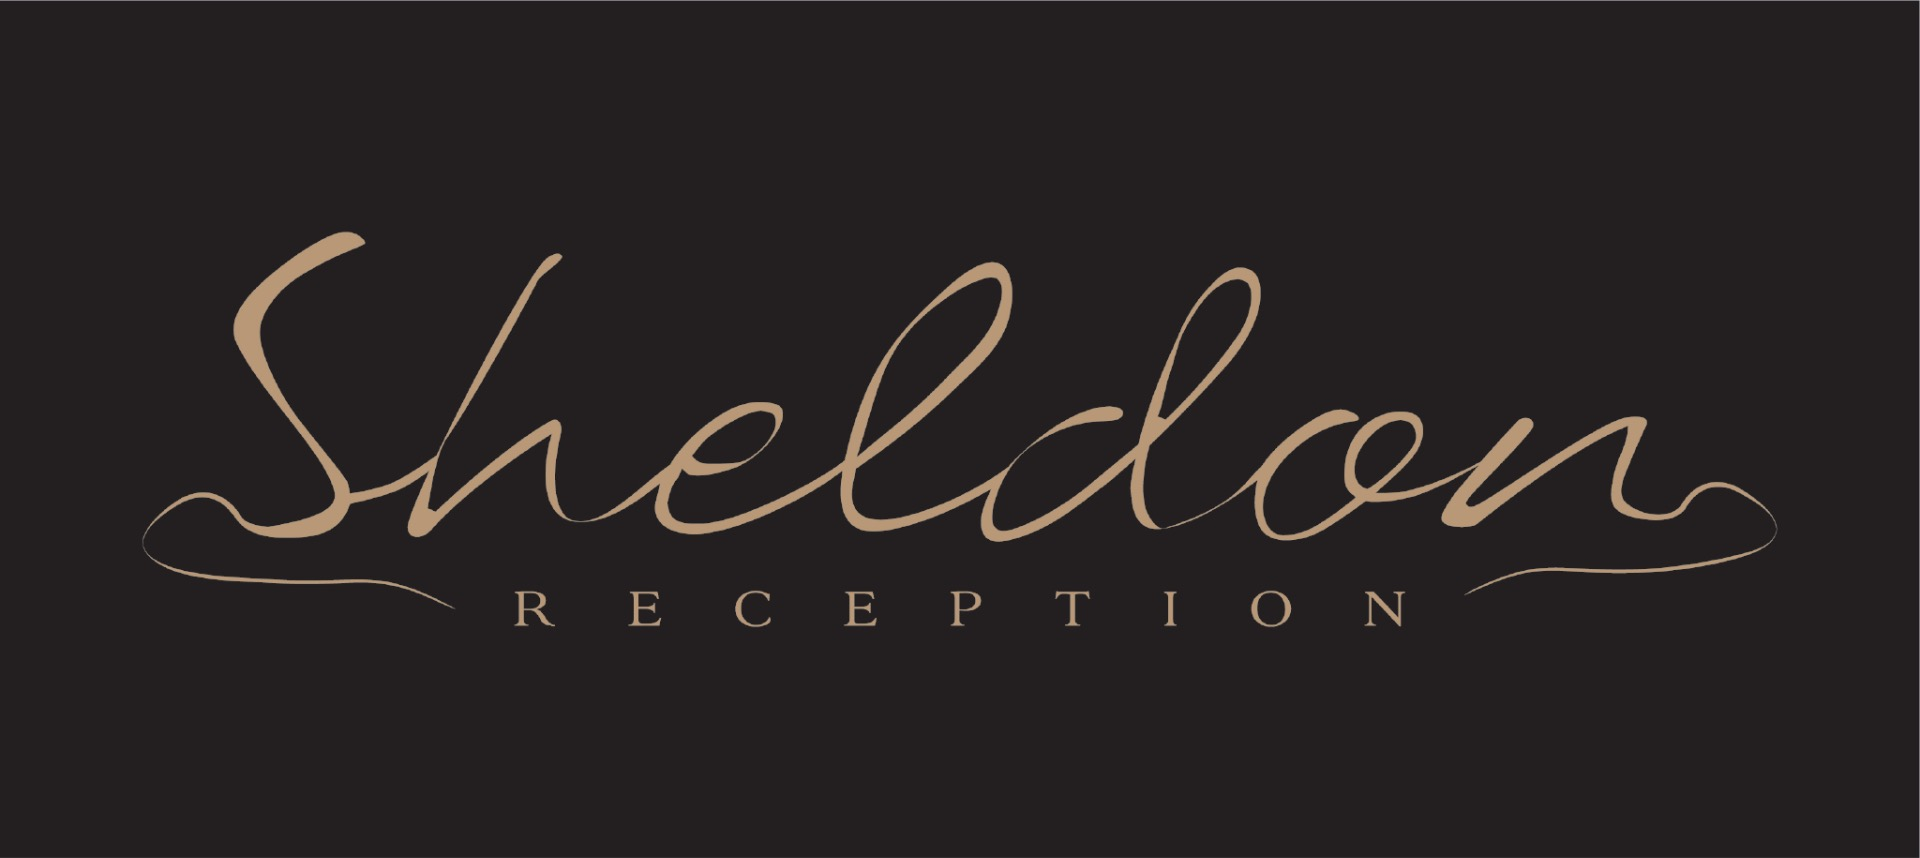 Sheldon Reception